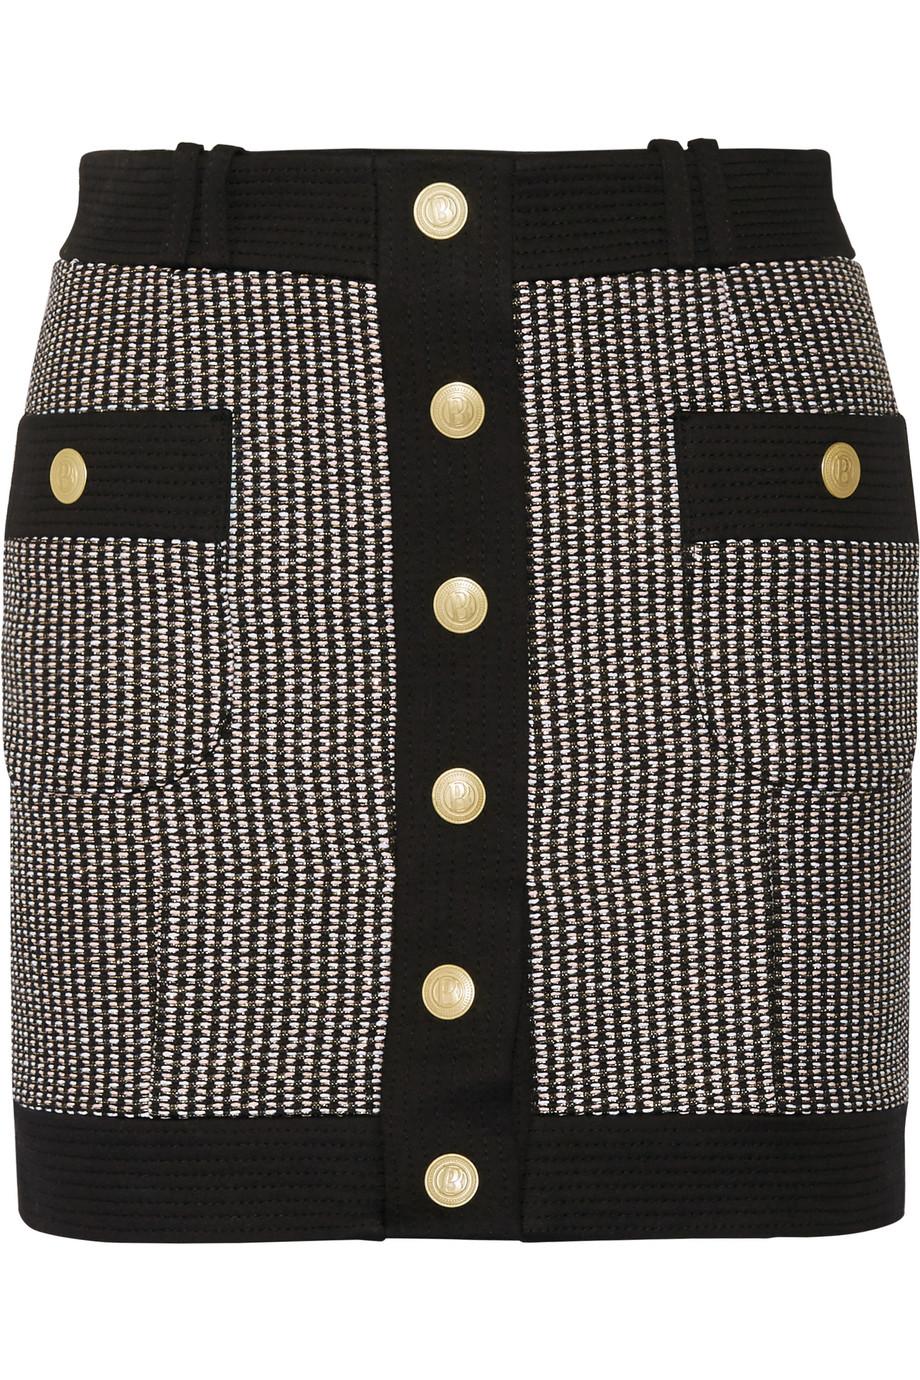 Pierre Balmain Cotton-Blend Tweed Mini Skirt, Black, Women's, Size: 38